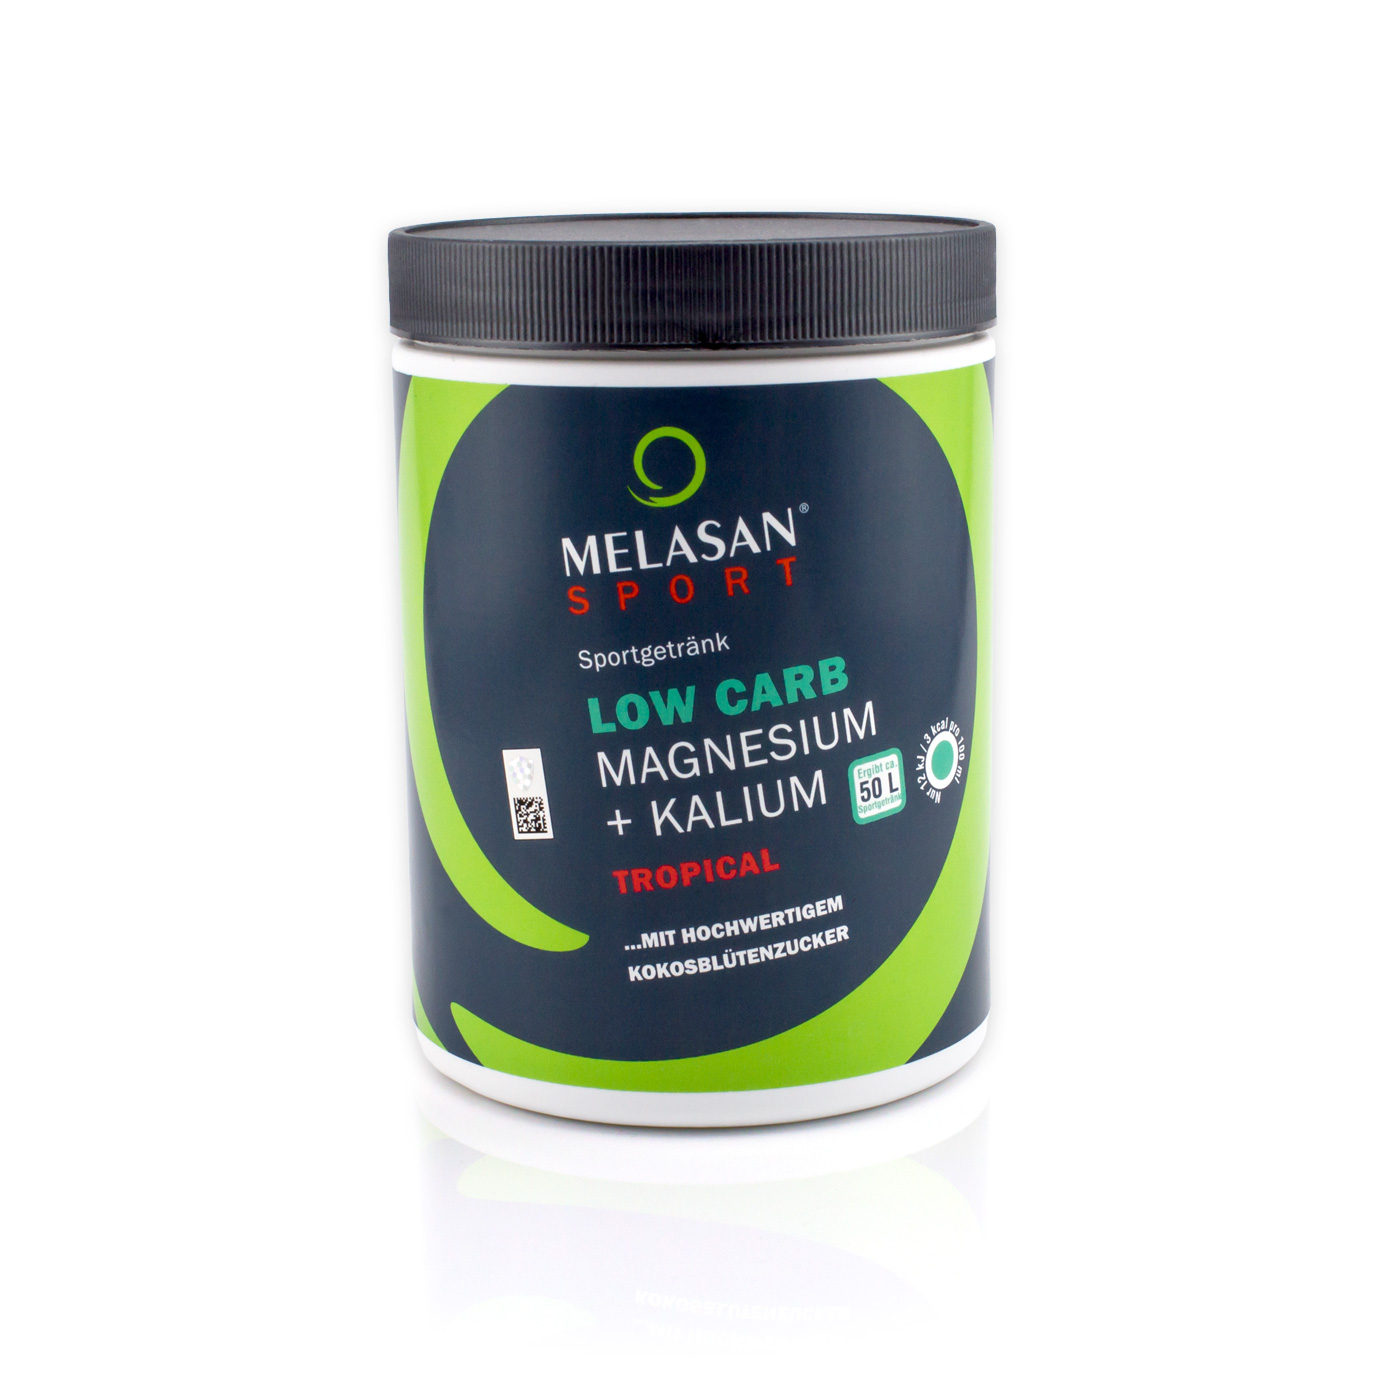 LOW CARB Magnesium + Kalium – Melasan Sport | Sportnahrung für ...